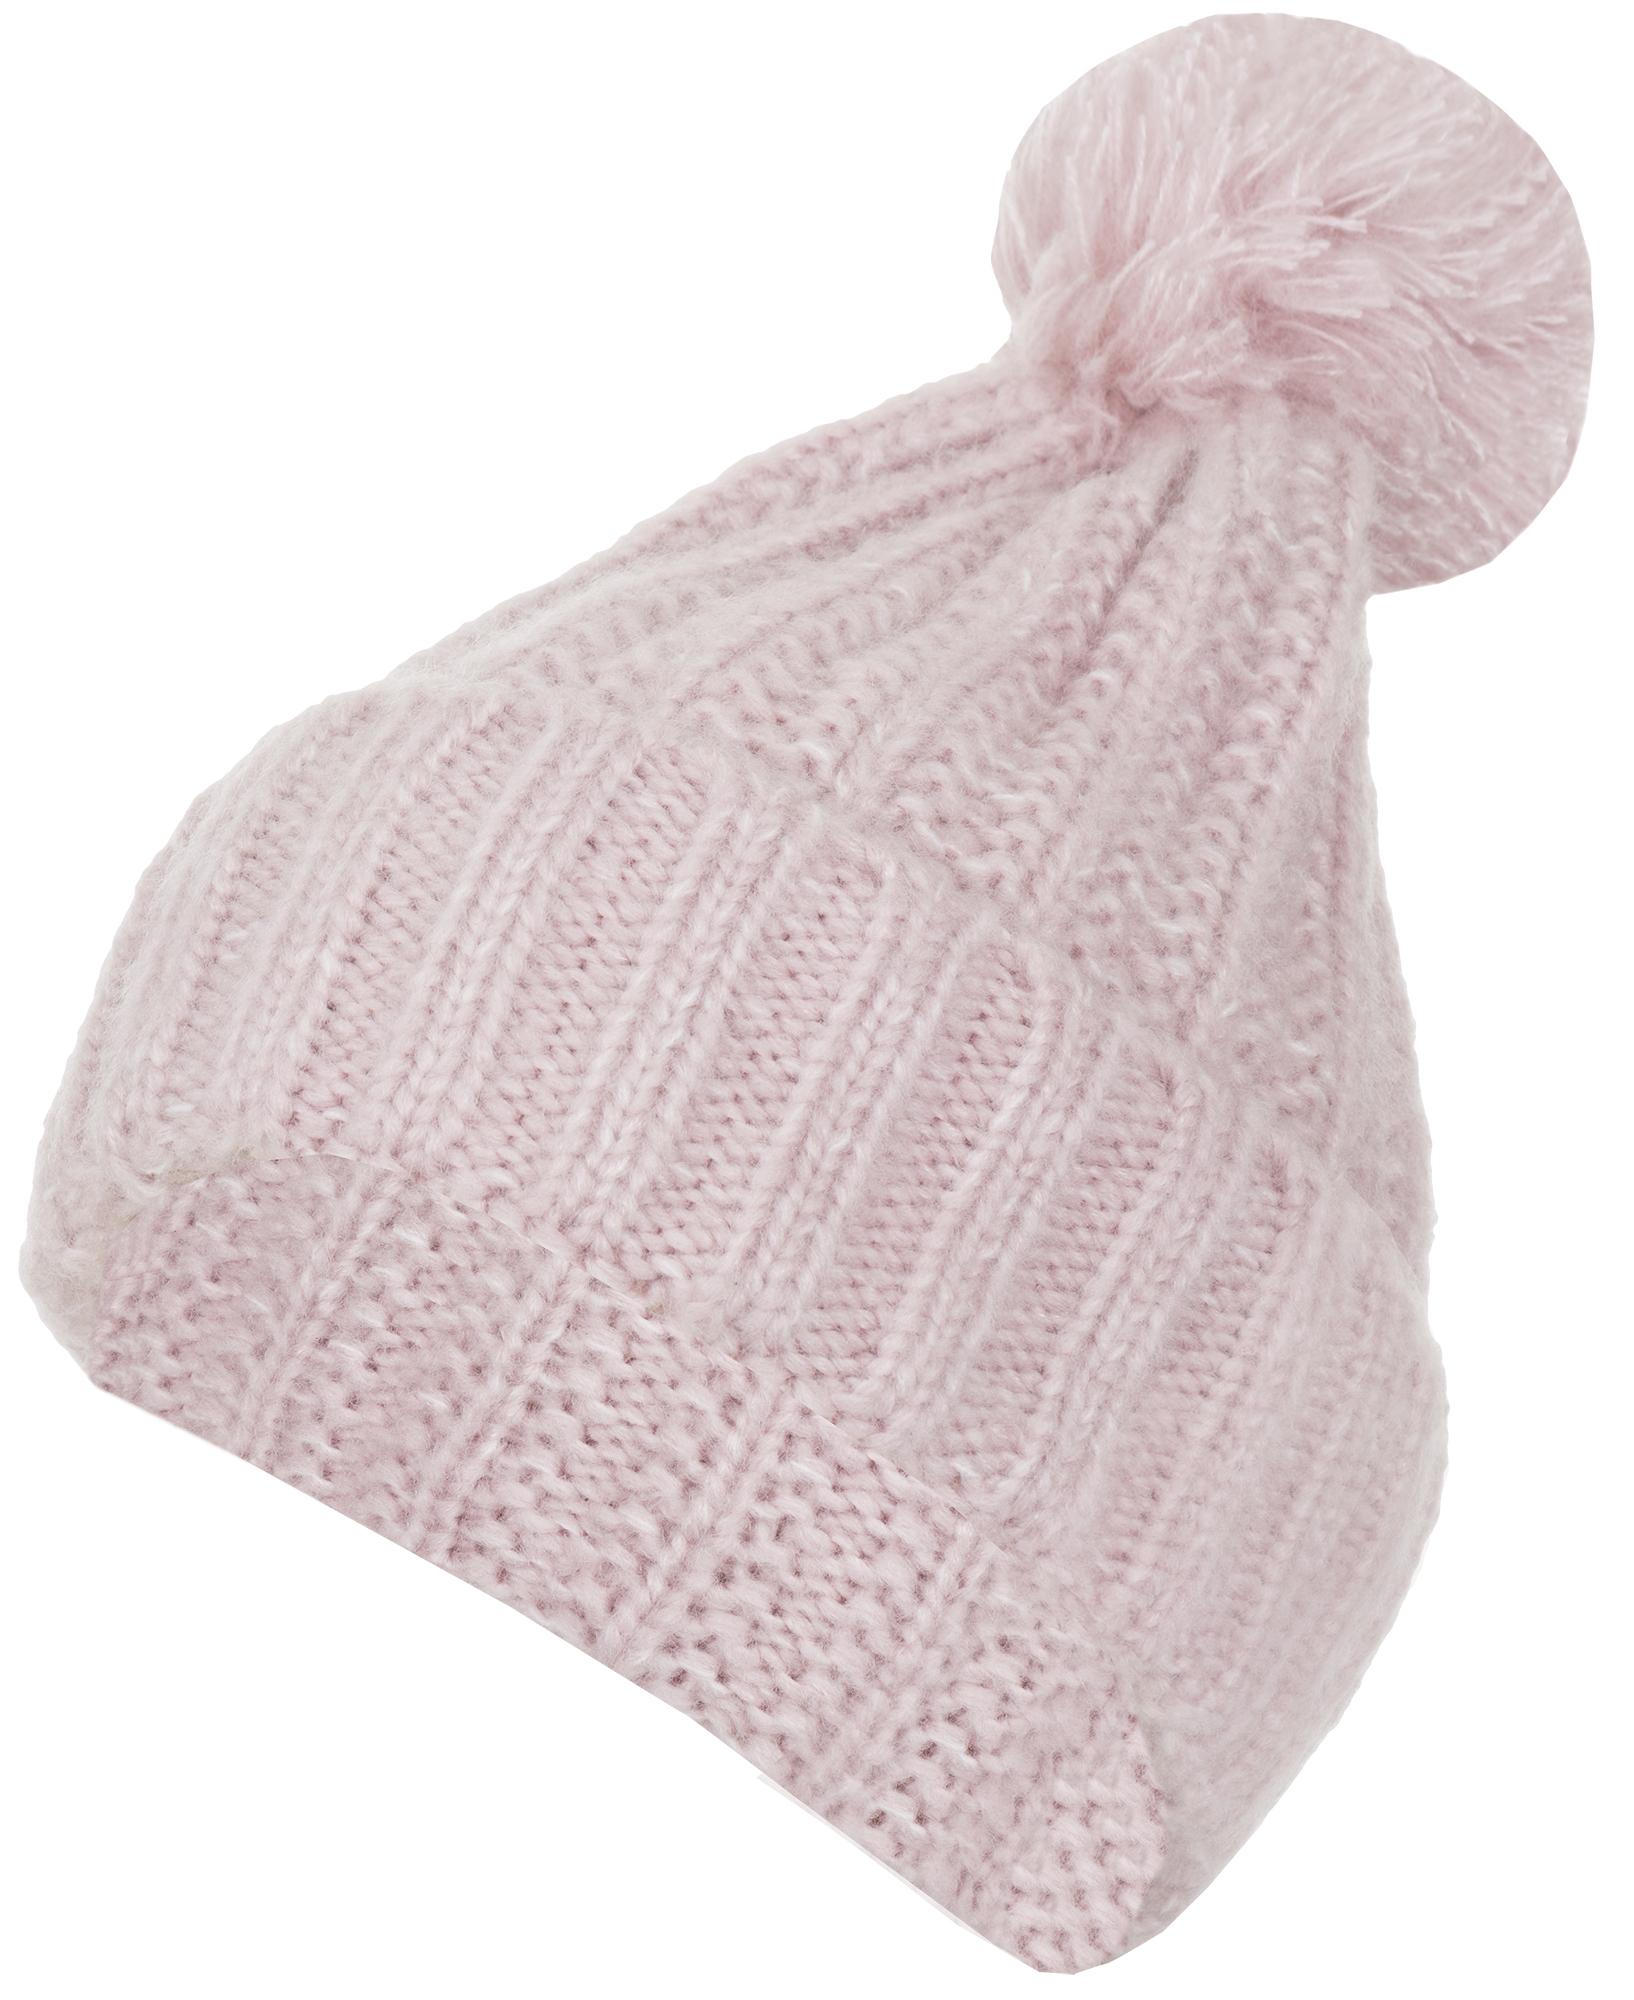 IcePeak Шапка женская IcePeak Aisla, размер Без размера icepeak шапка для девочек icepeak lito размер без размера